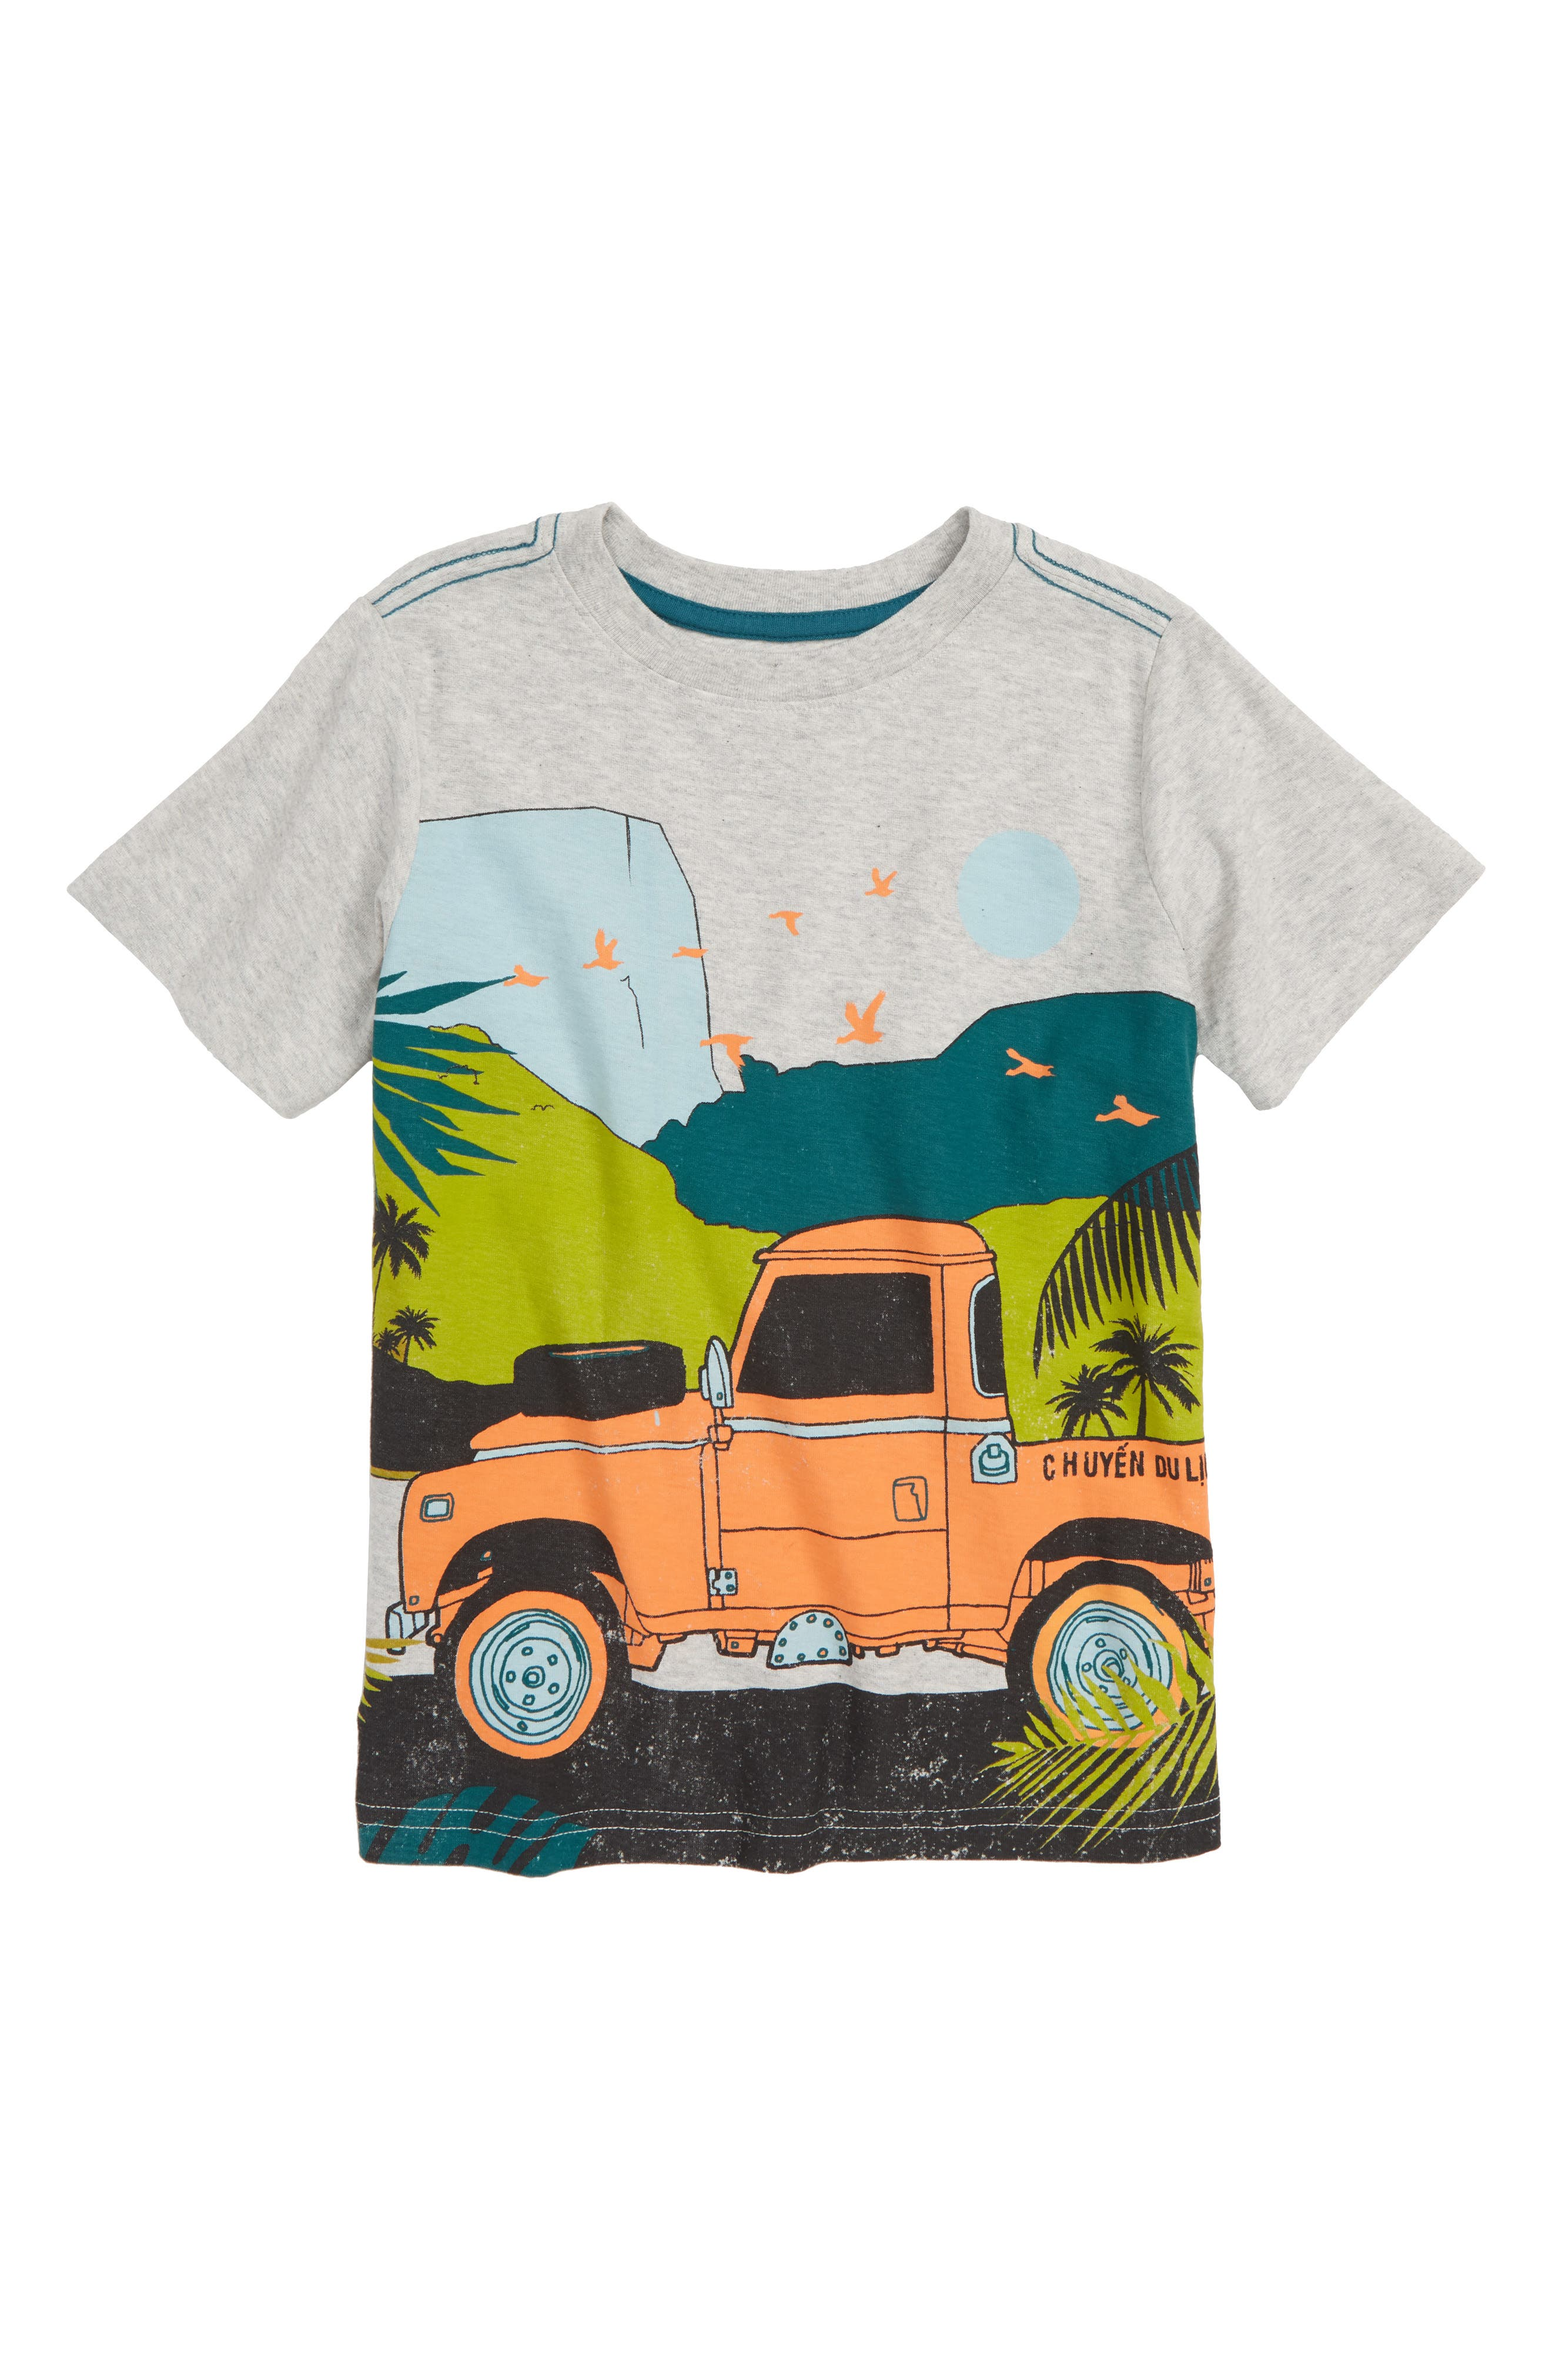 Trek Truck T-Shirt,                             Main thumbnail 1, color,                             LIGHT GREY HEATHER